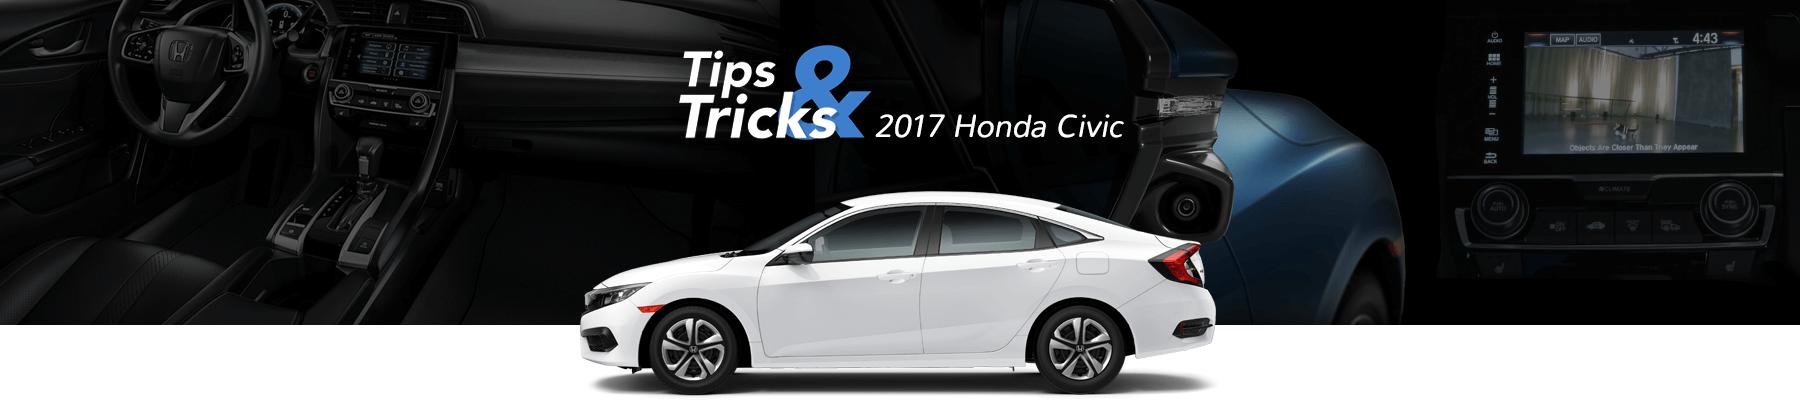 2017 Honda Civic Tips & Tricks Banner